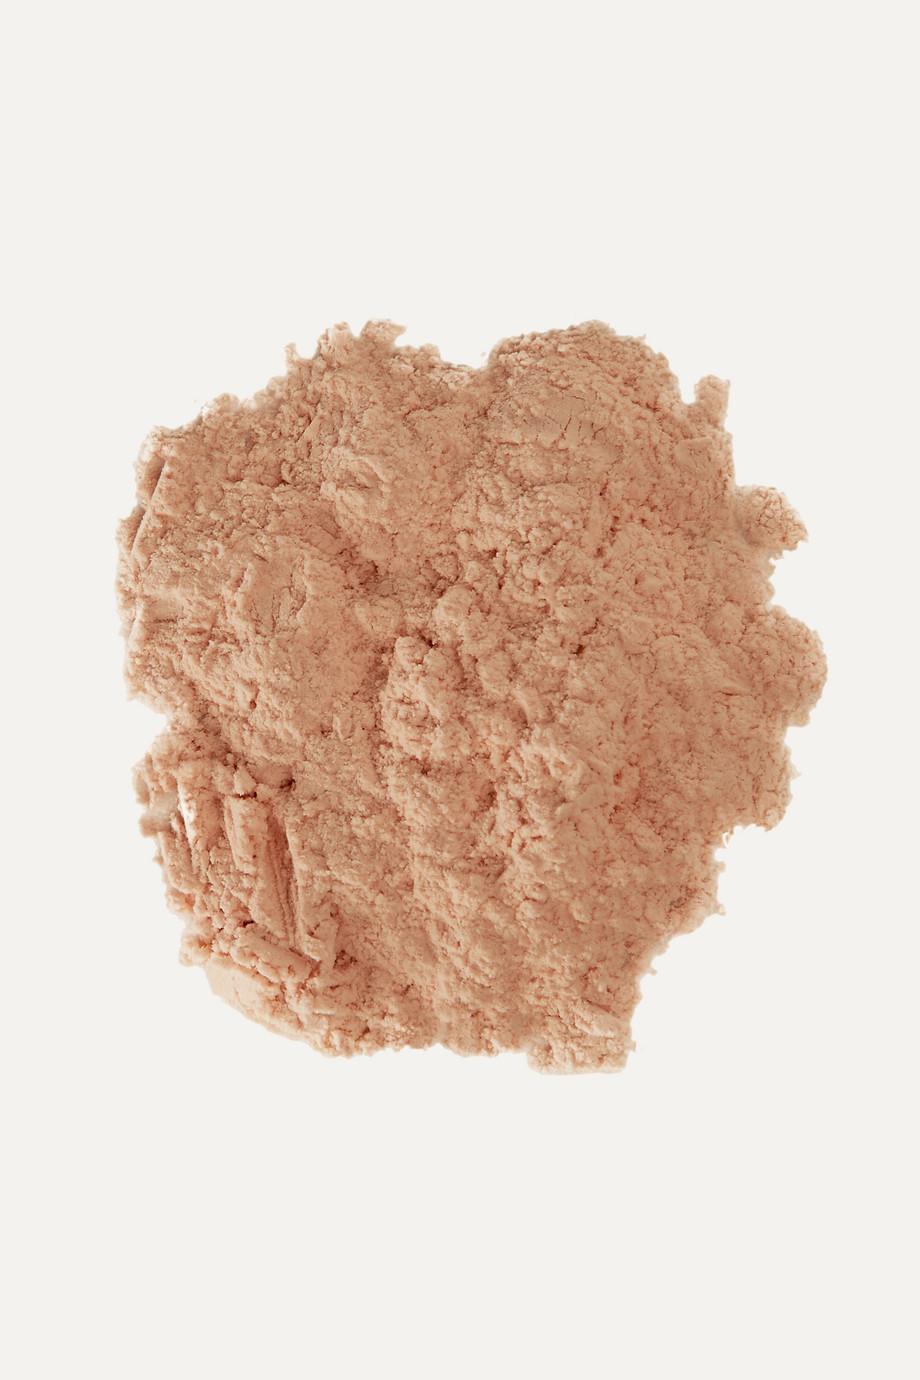 Huda Beauty Poudre libre Easy Bake, Cinnamon Bun